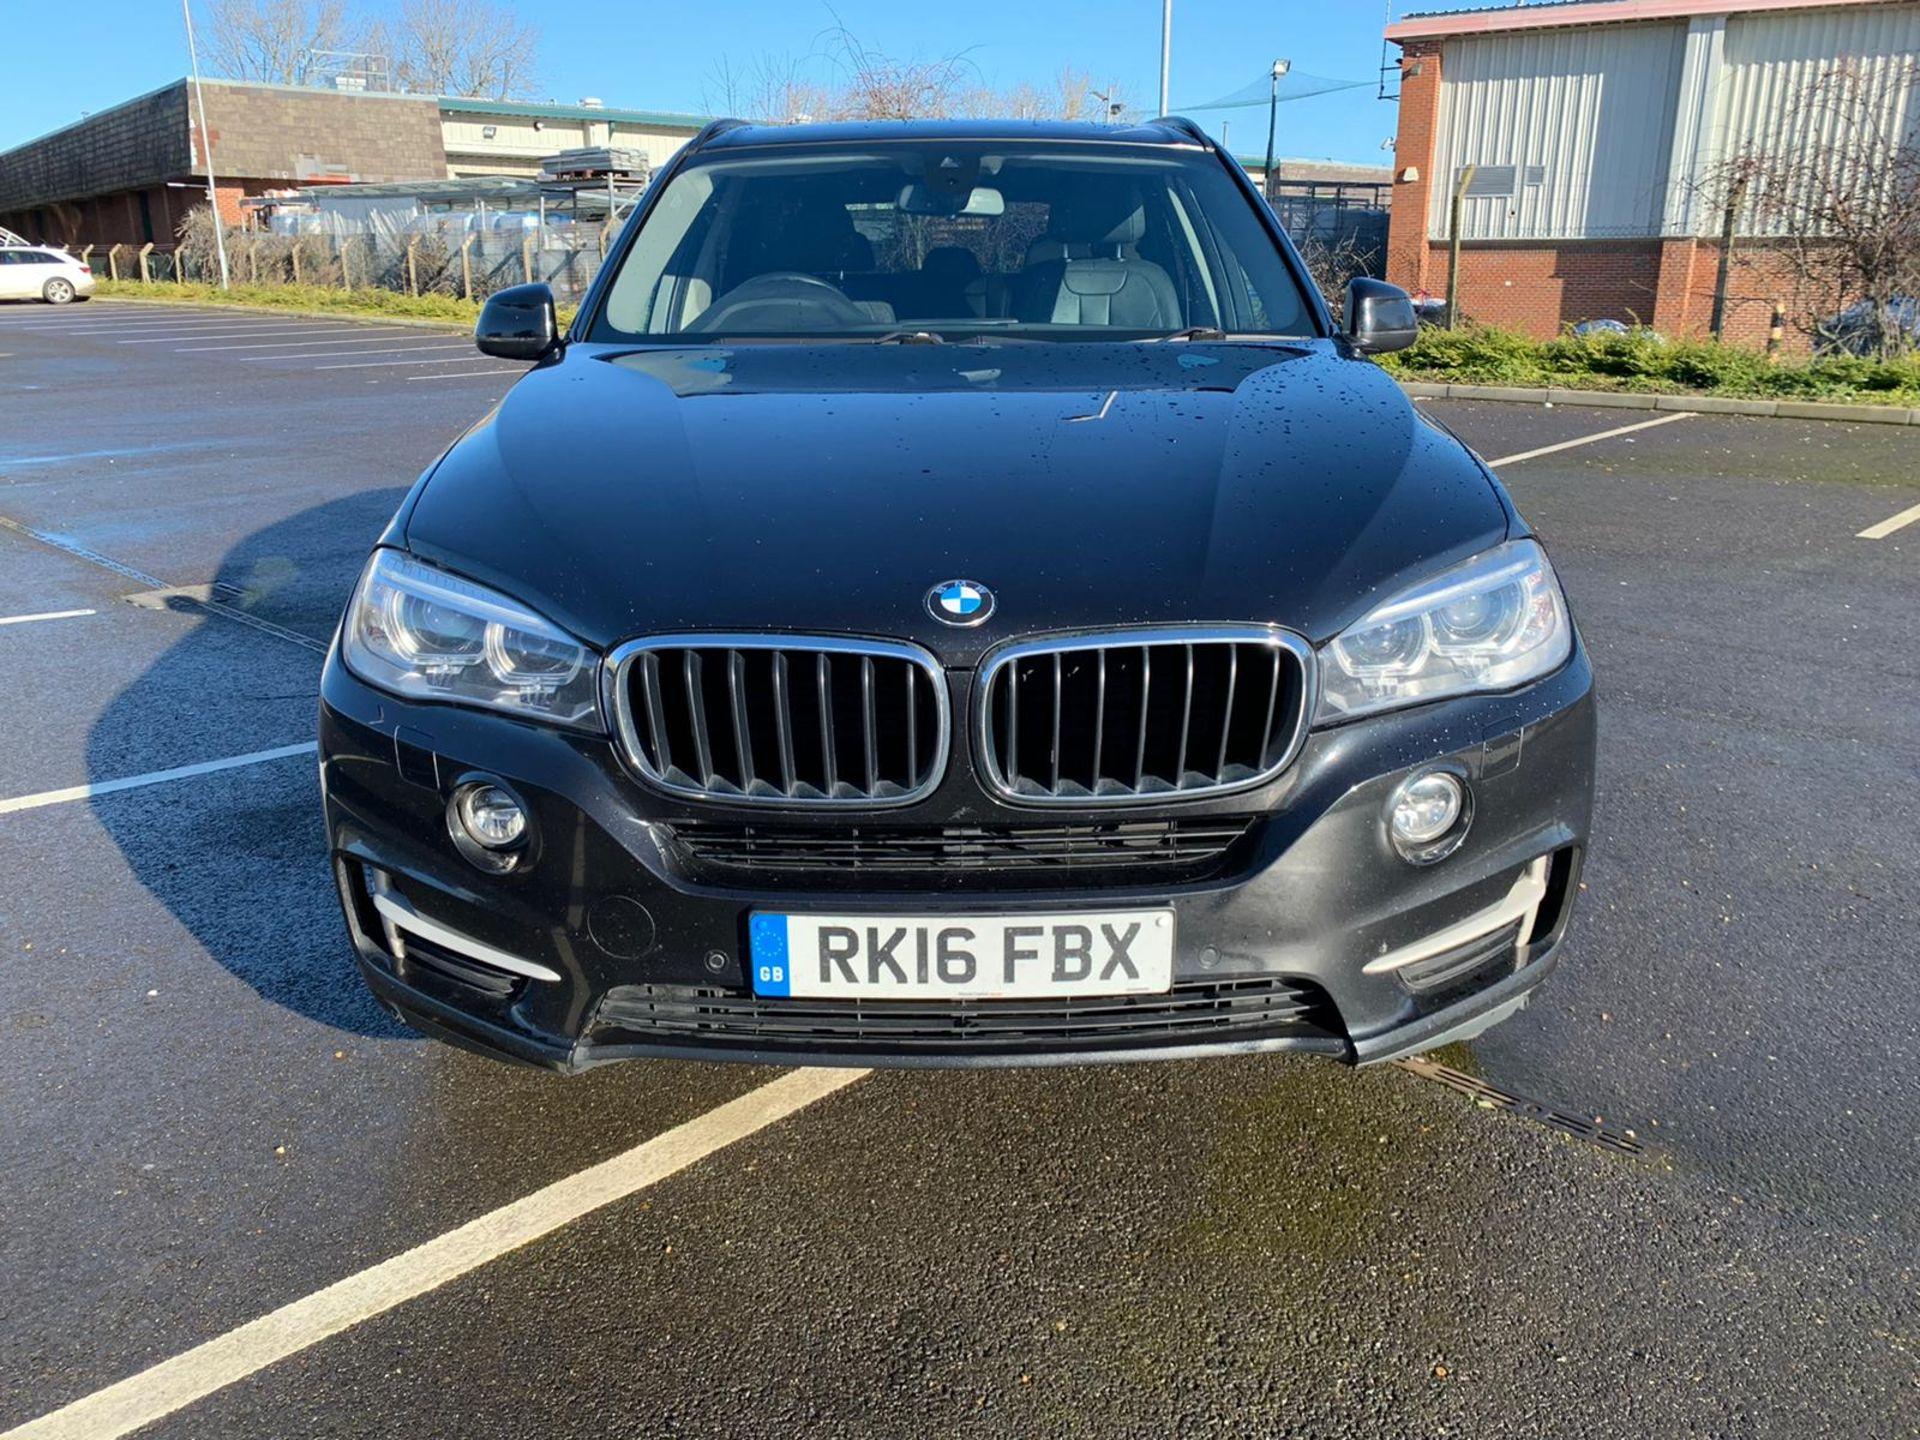 "(Reserve Met) BMW X5 2.0d S-DRIVE ""Special Equipment"" Auto- 7 Seater -16 Reg - Sat Nav- (New Shape) - Image 4 of 43"